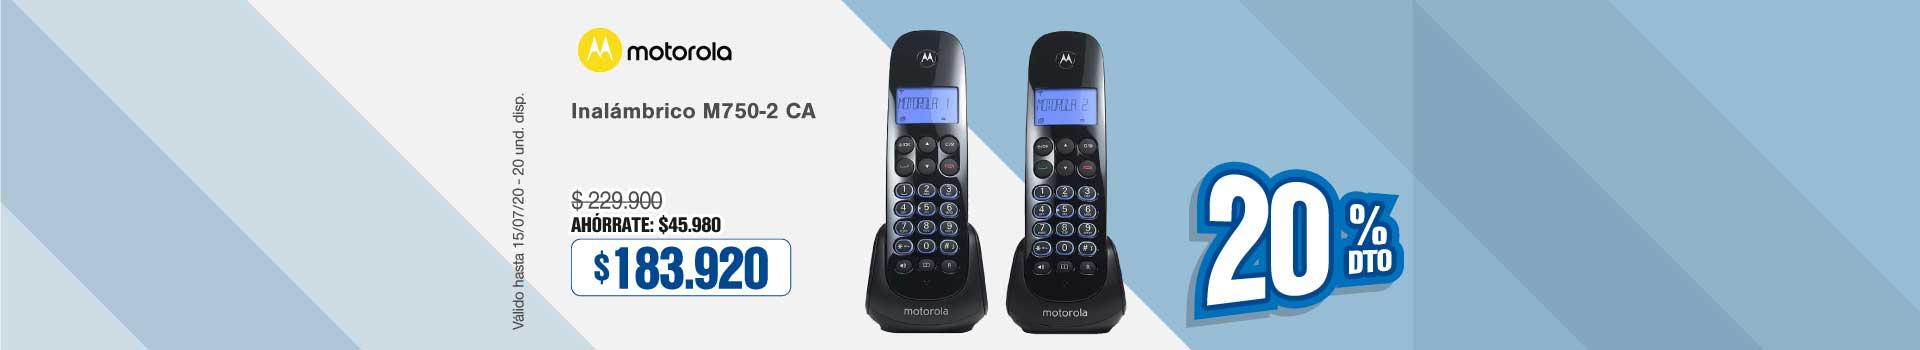 AK-KT-TELEFONIA-MOTOROLA-INALAMBRICO-11-JULIO